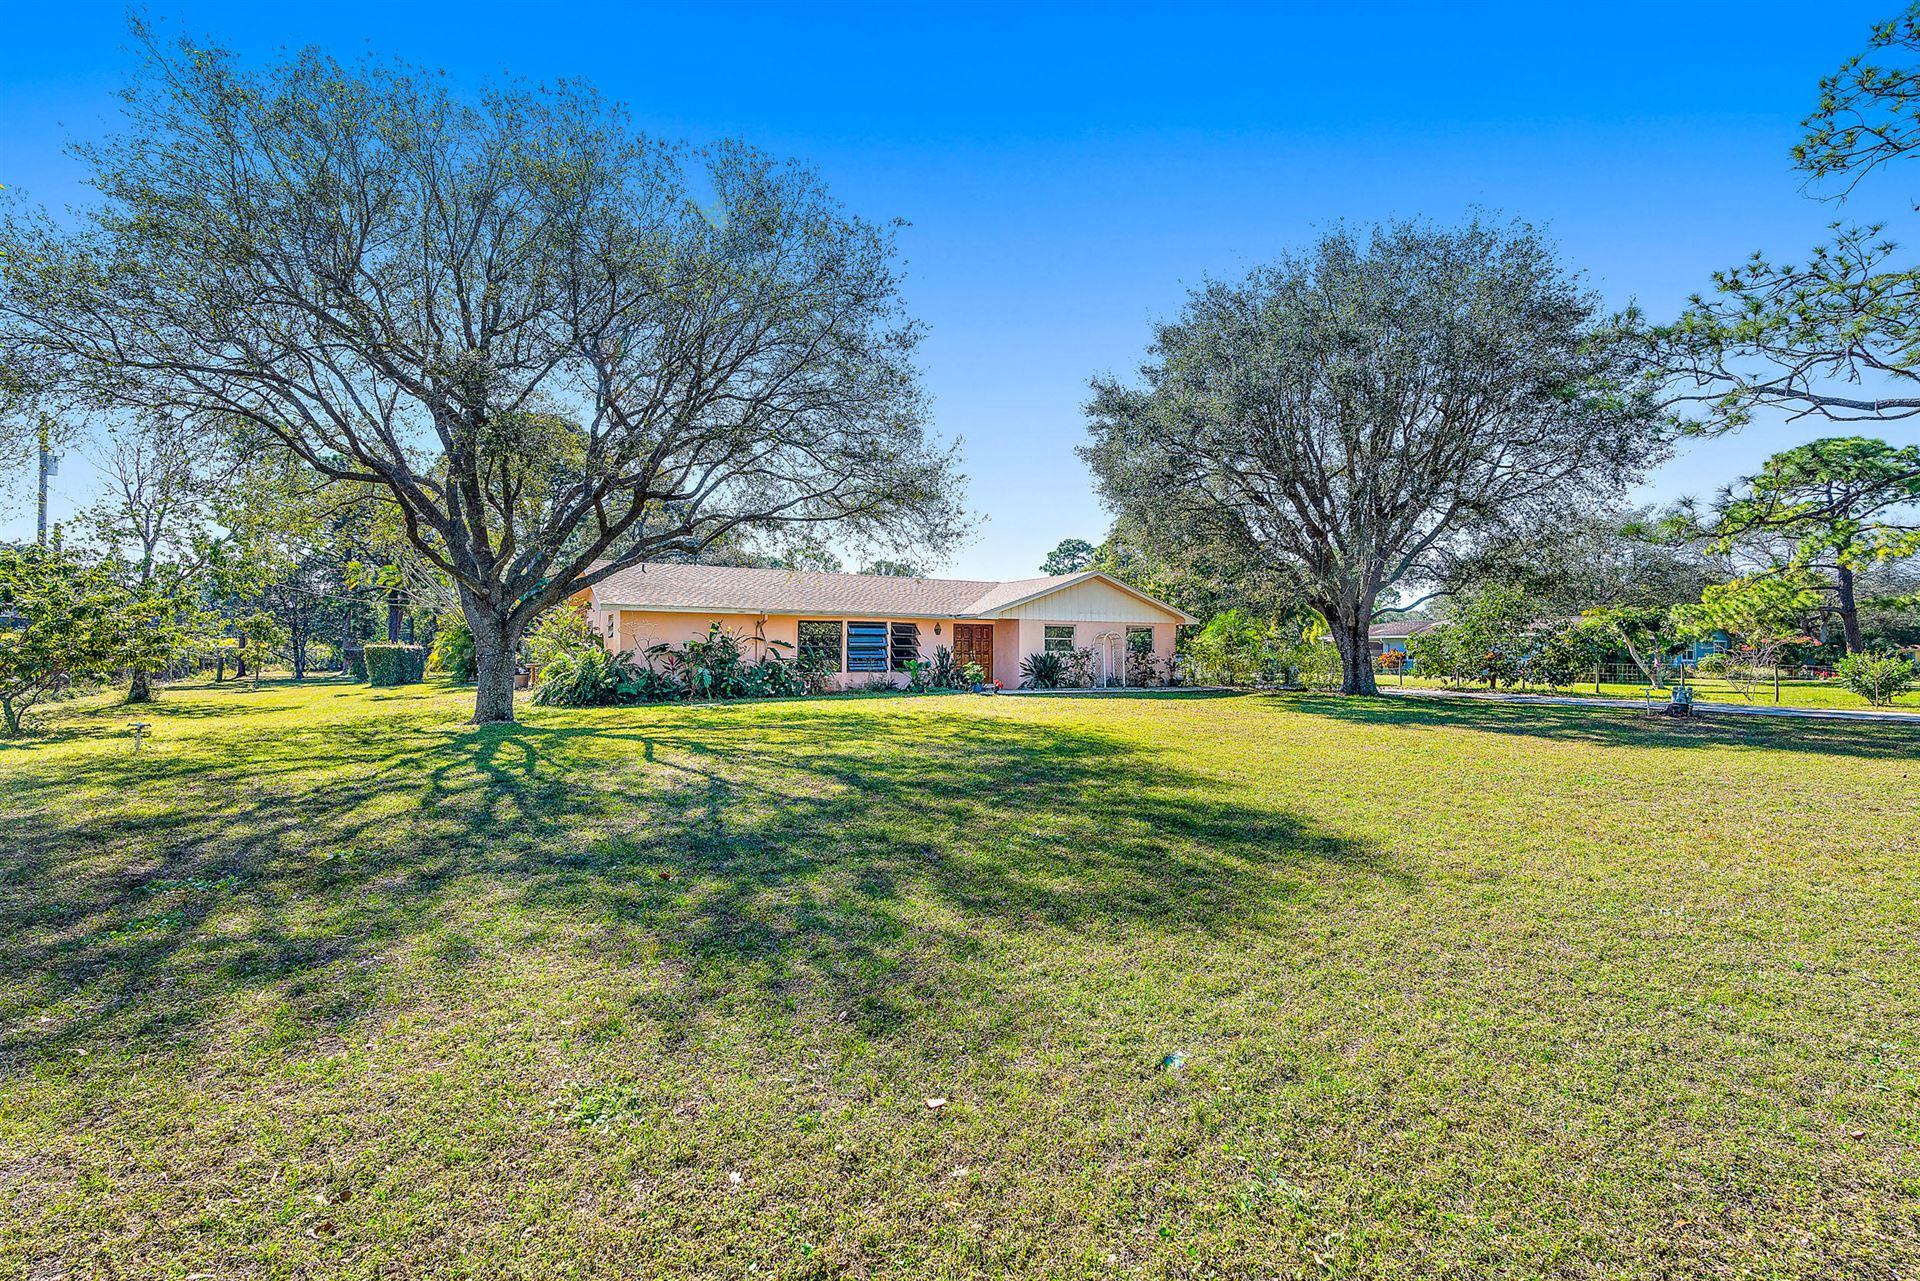 6202 Rocking Horse Road, Jupiter, FL 33458 - #: RX-10687530